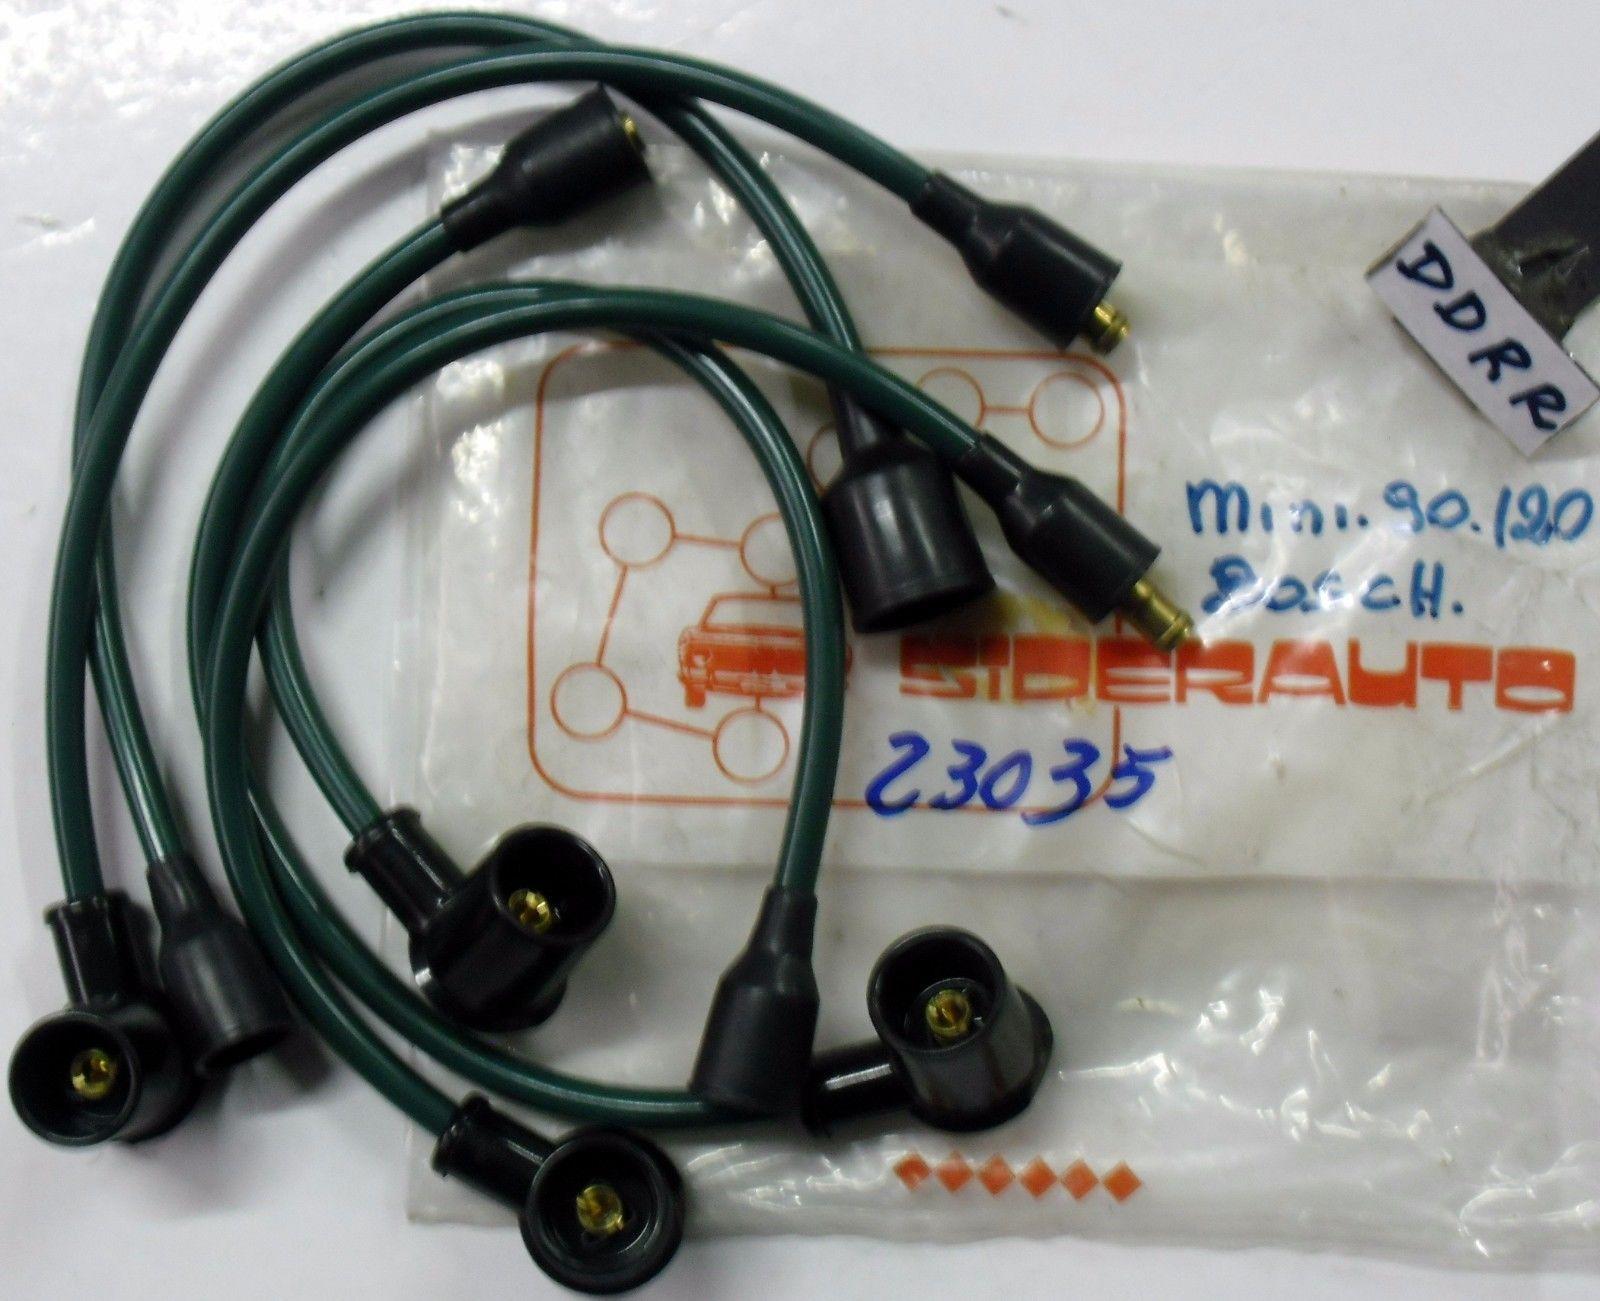 SERIE CAVI CANDELE FIAT 127-1050c  SIDERAUTO 23037